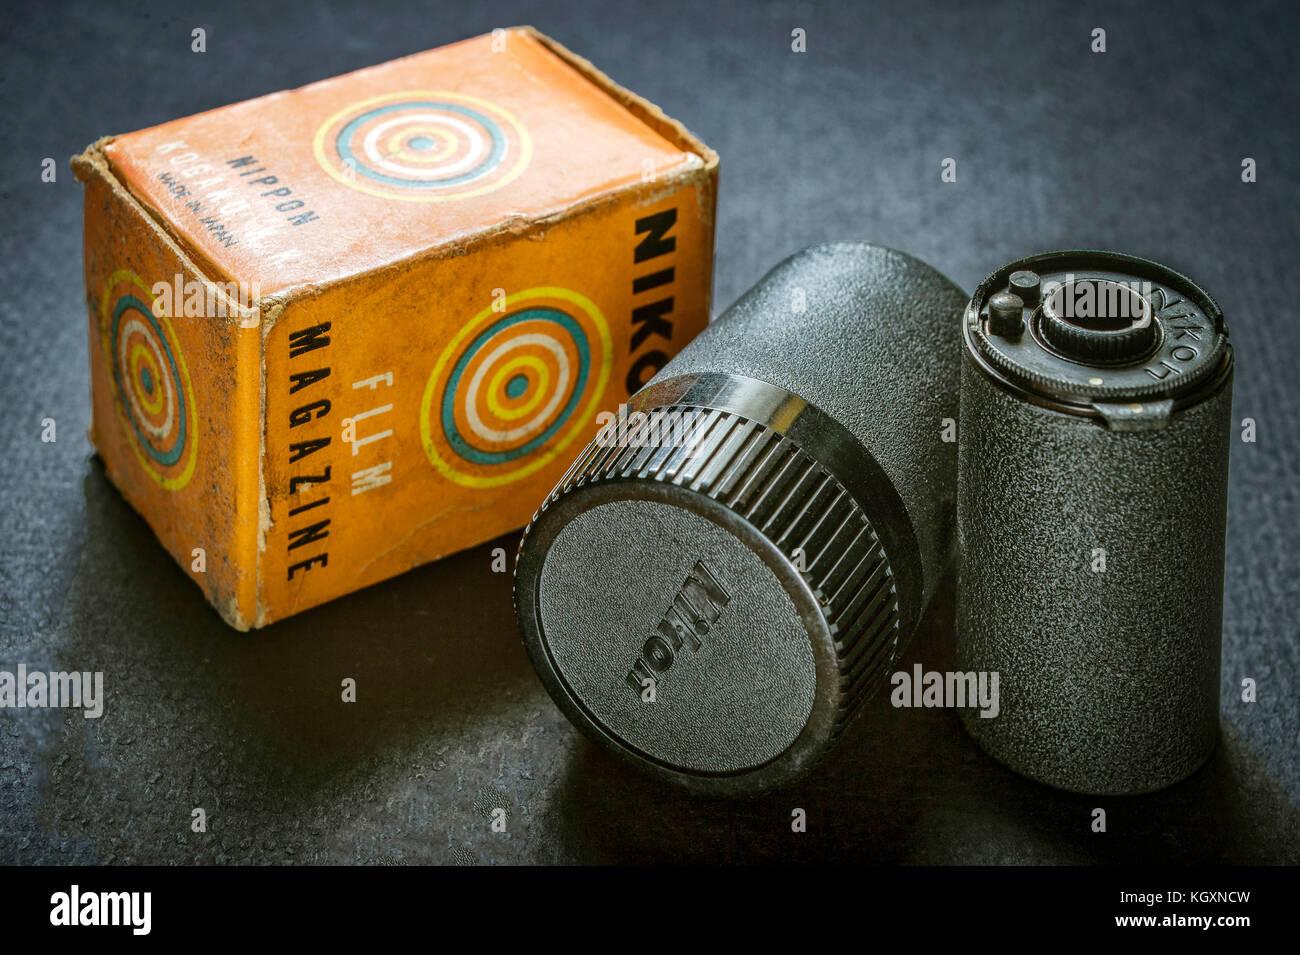 Nikon Zielfernrohr Mit Entfernungsmesser : Nikon box stockfotos bilder alamy